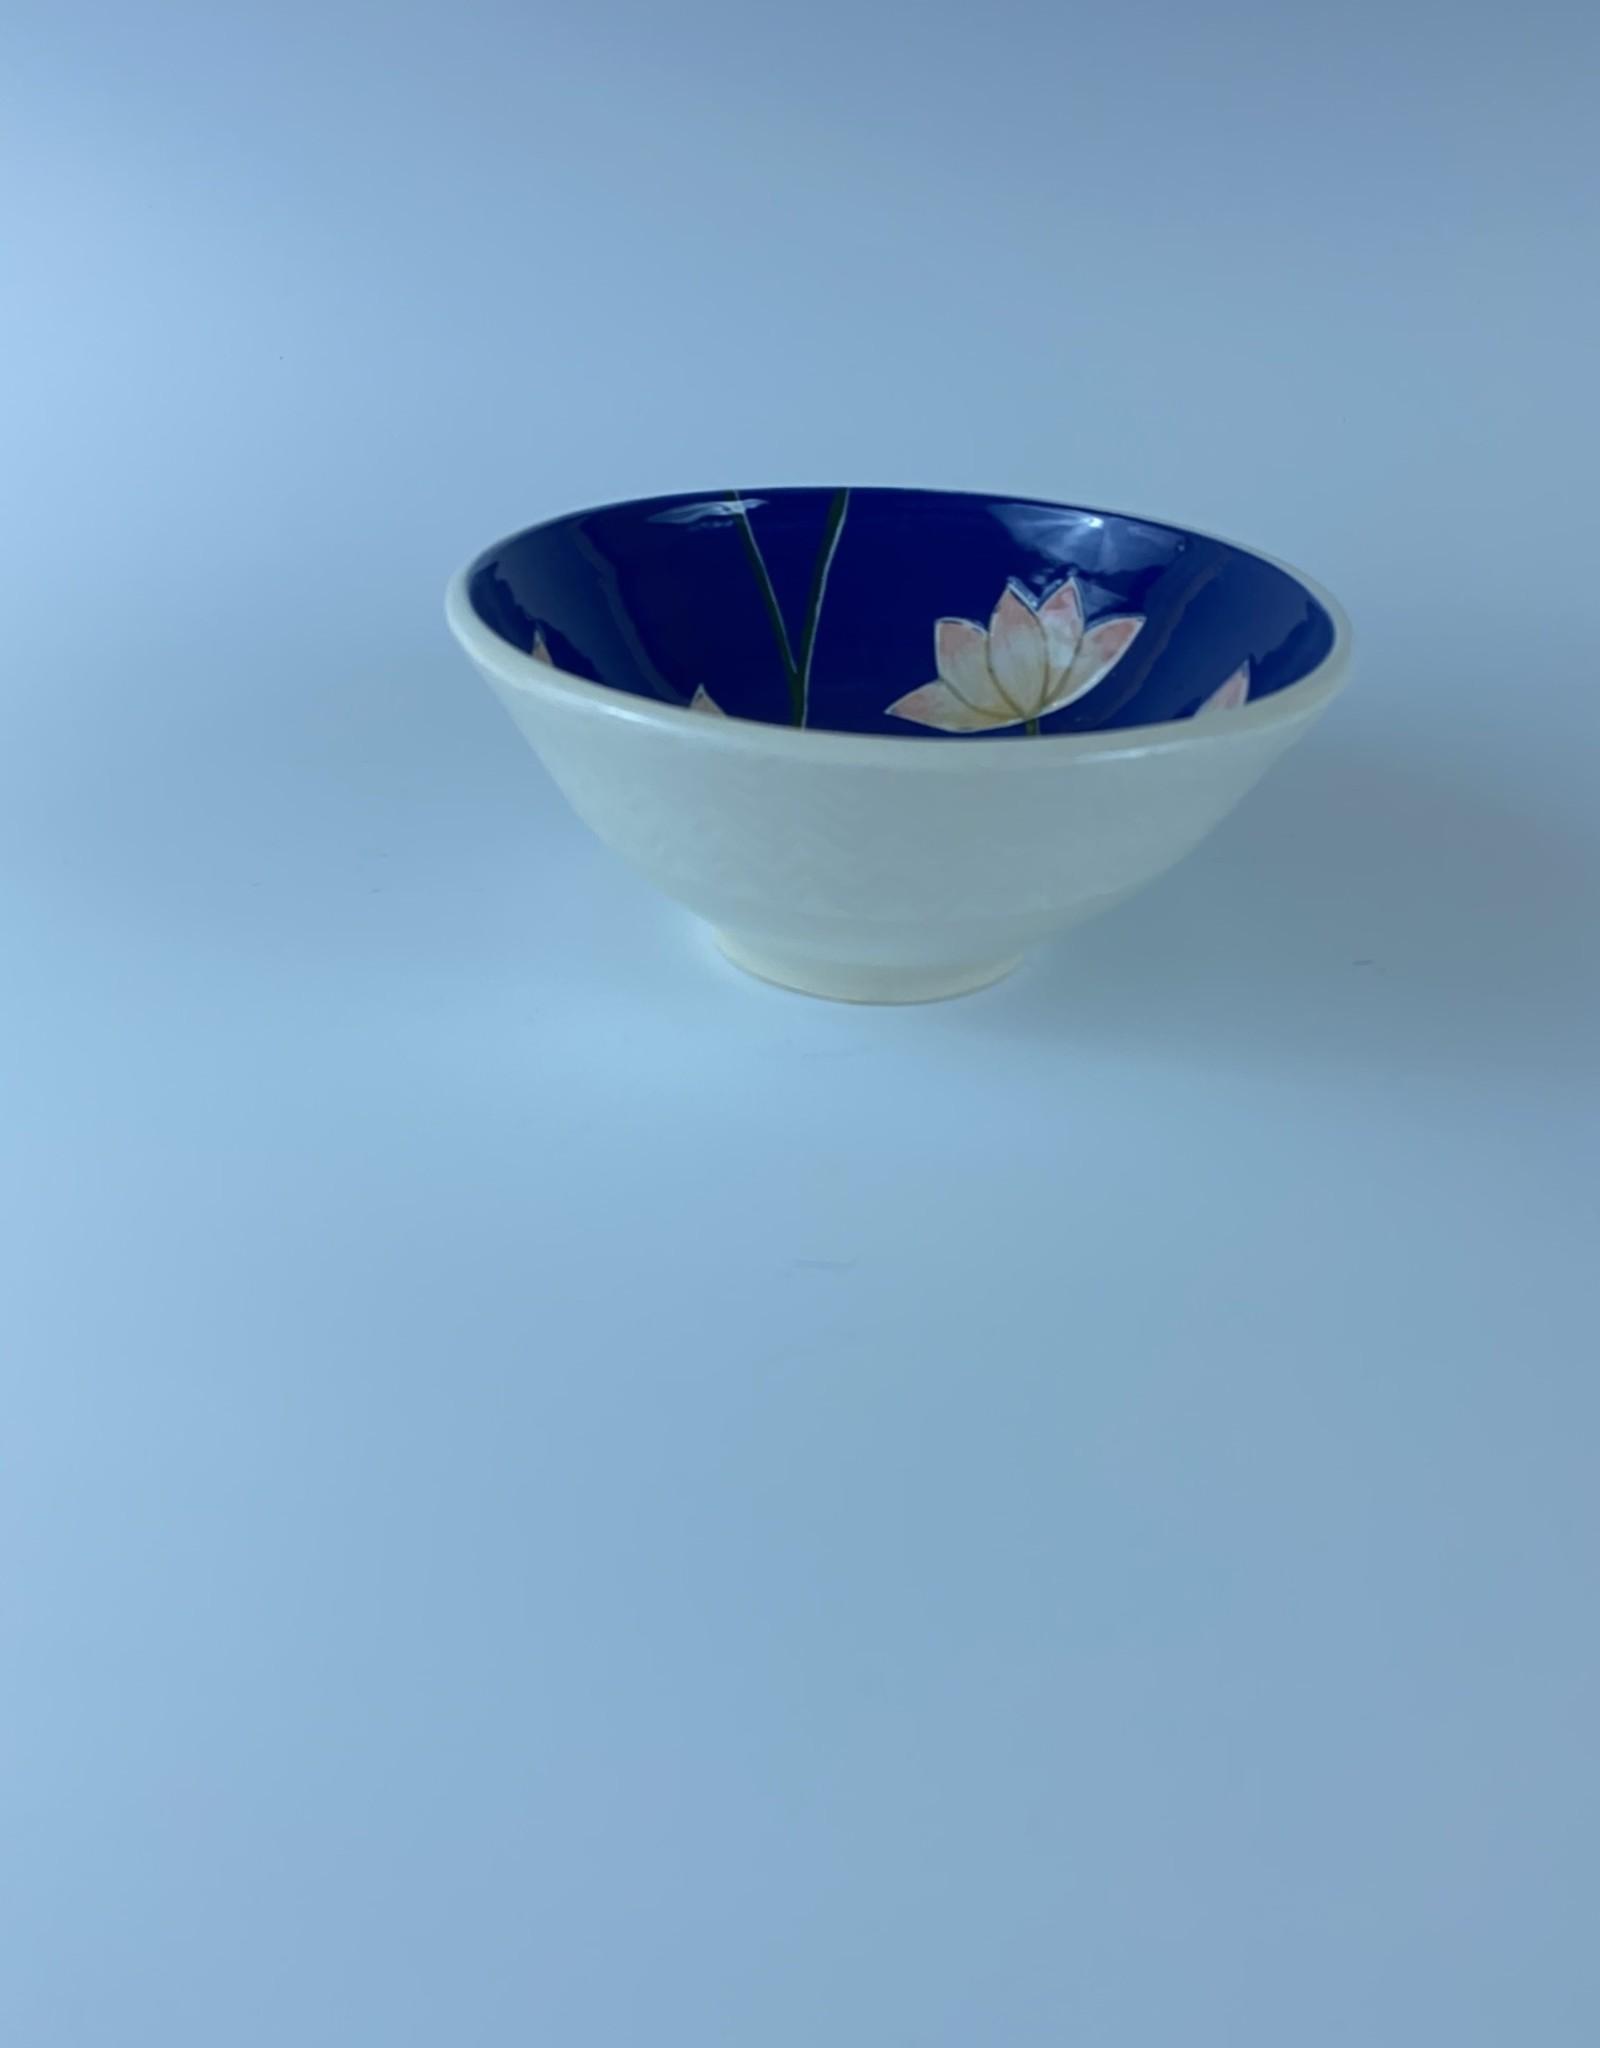 Anshula Tayal Amaati Pichwai Lotus Bowl (Small)